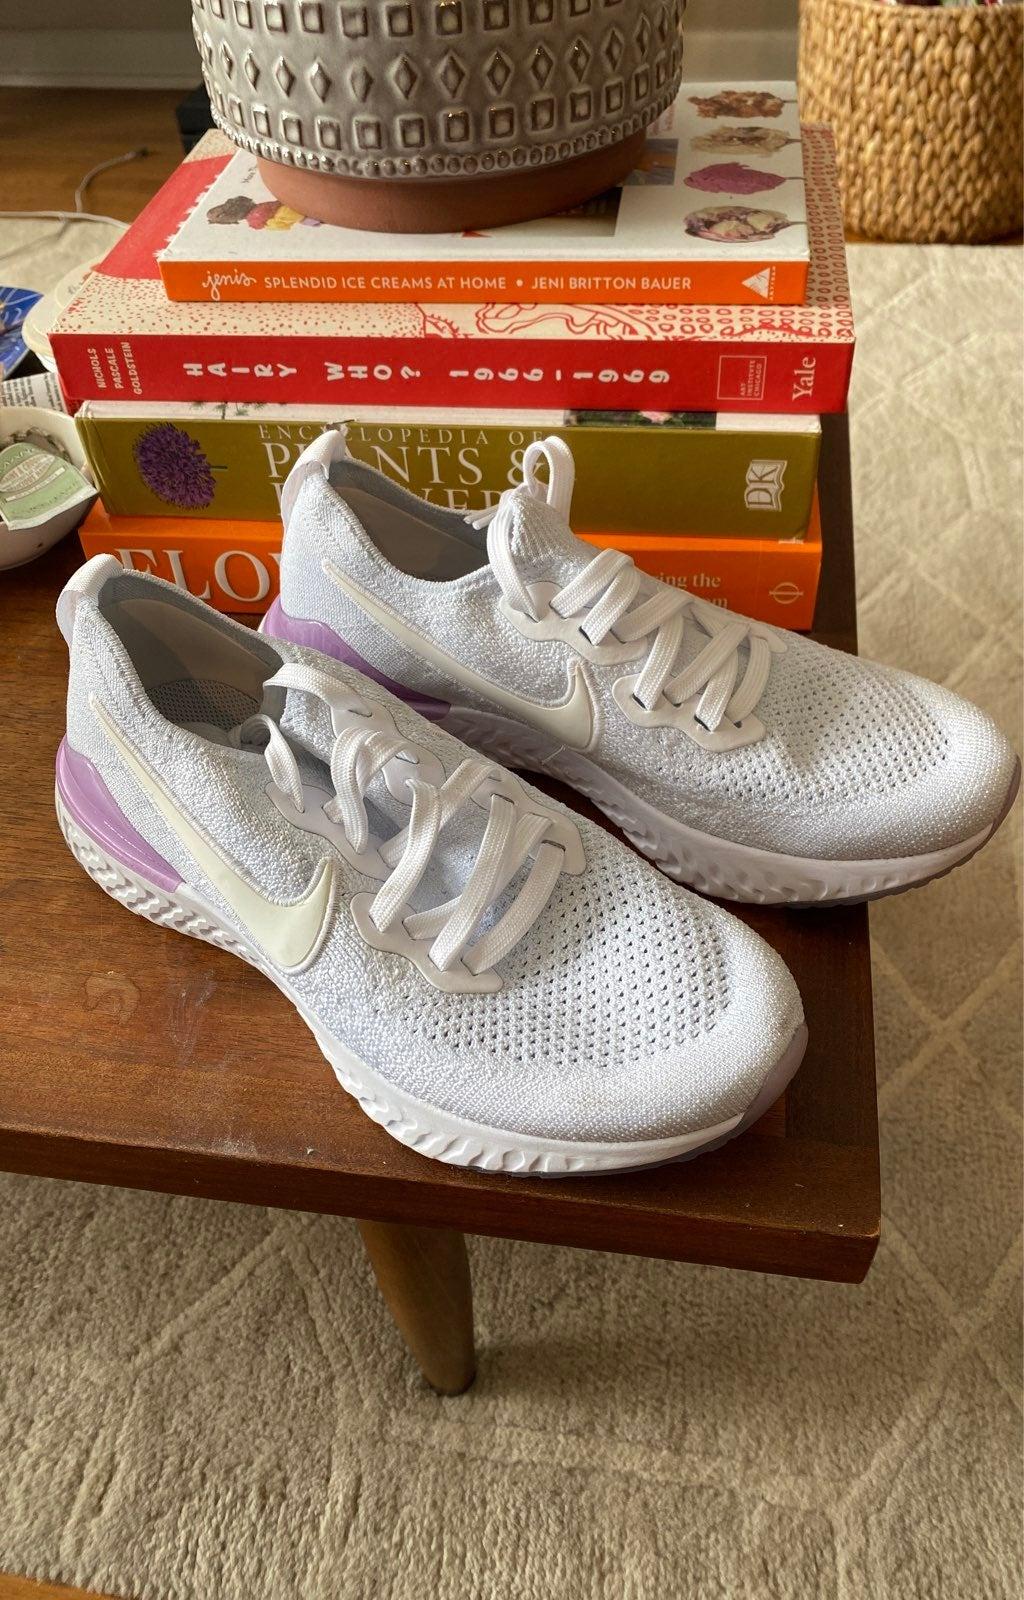 Nike Epic React Flyknit 2 Shoes